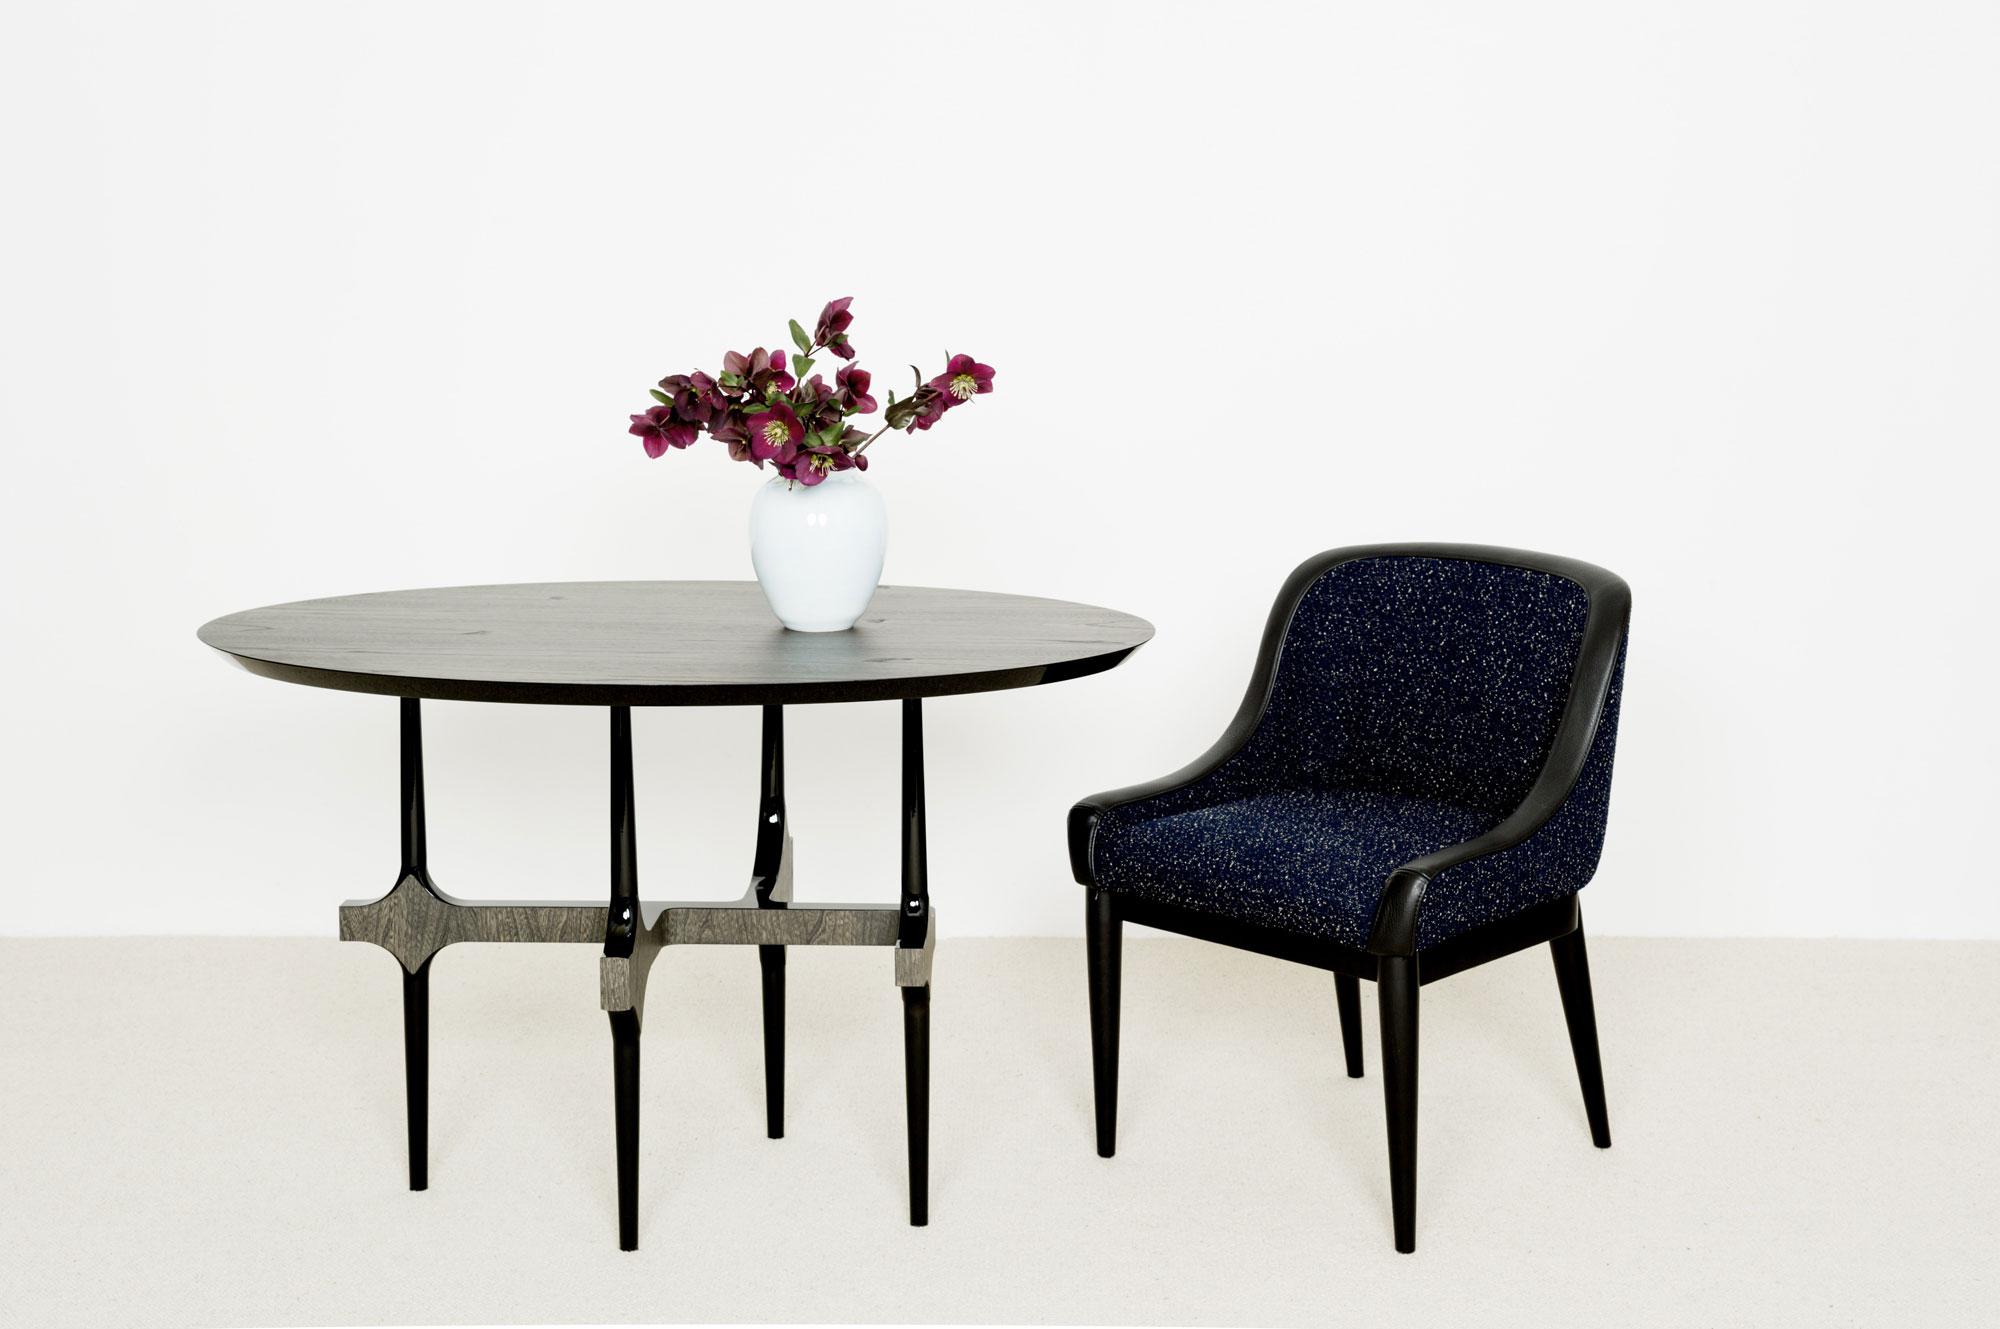 Til Table Lys Chaise - Christophe Delcourt